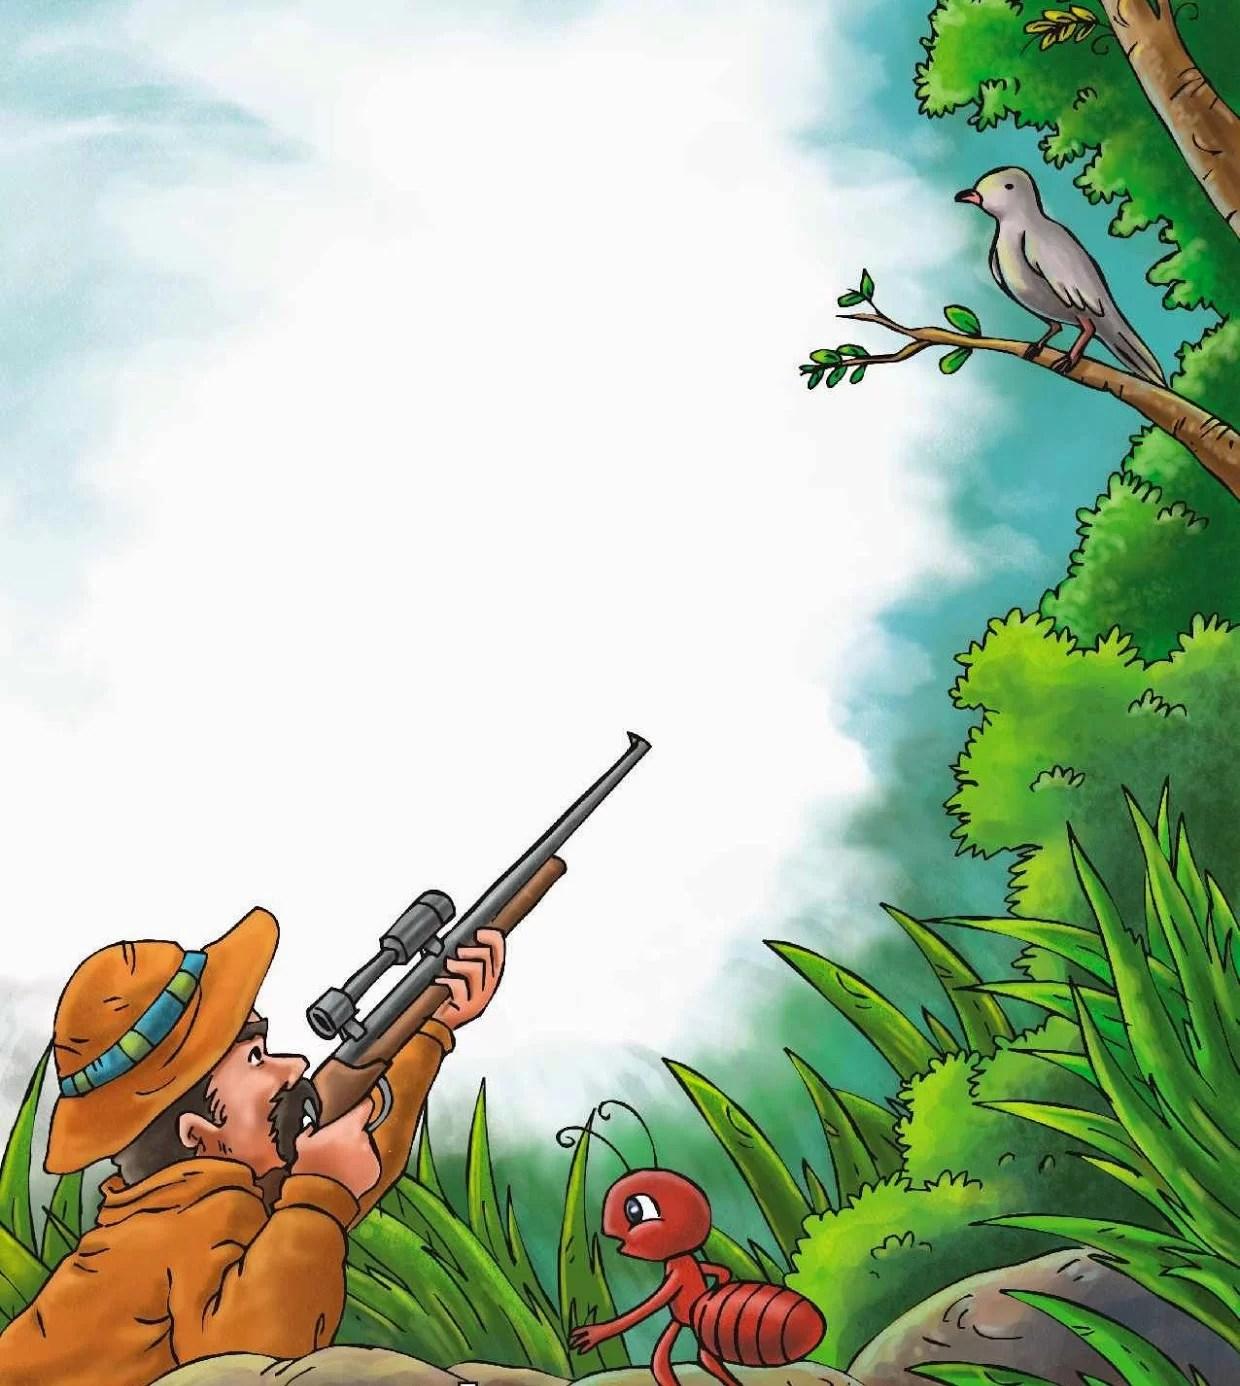 Cerita Dongeng Hewan Semut dan Burung Merpati